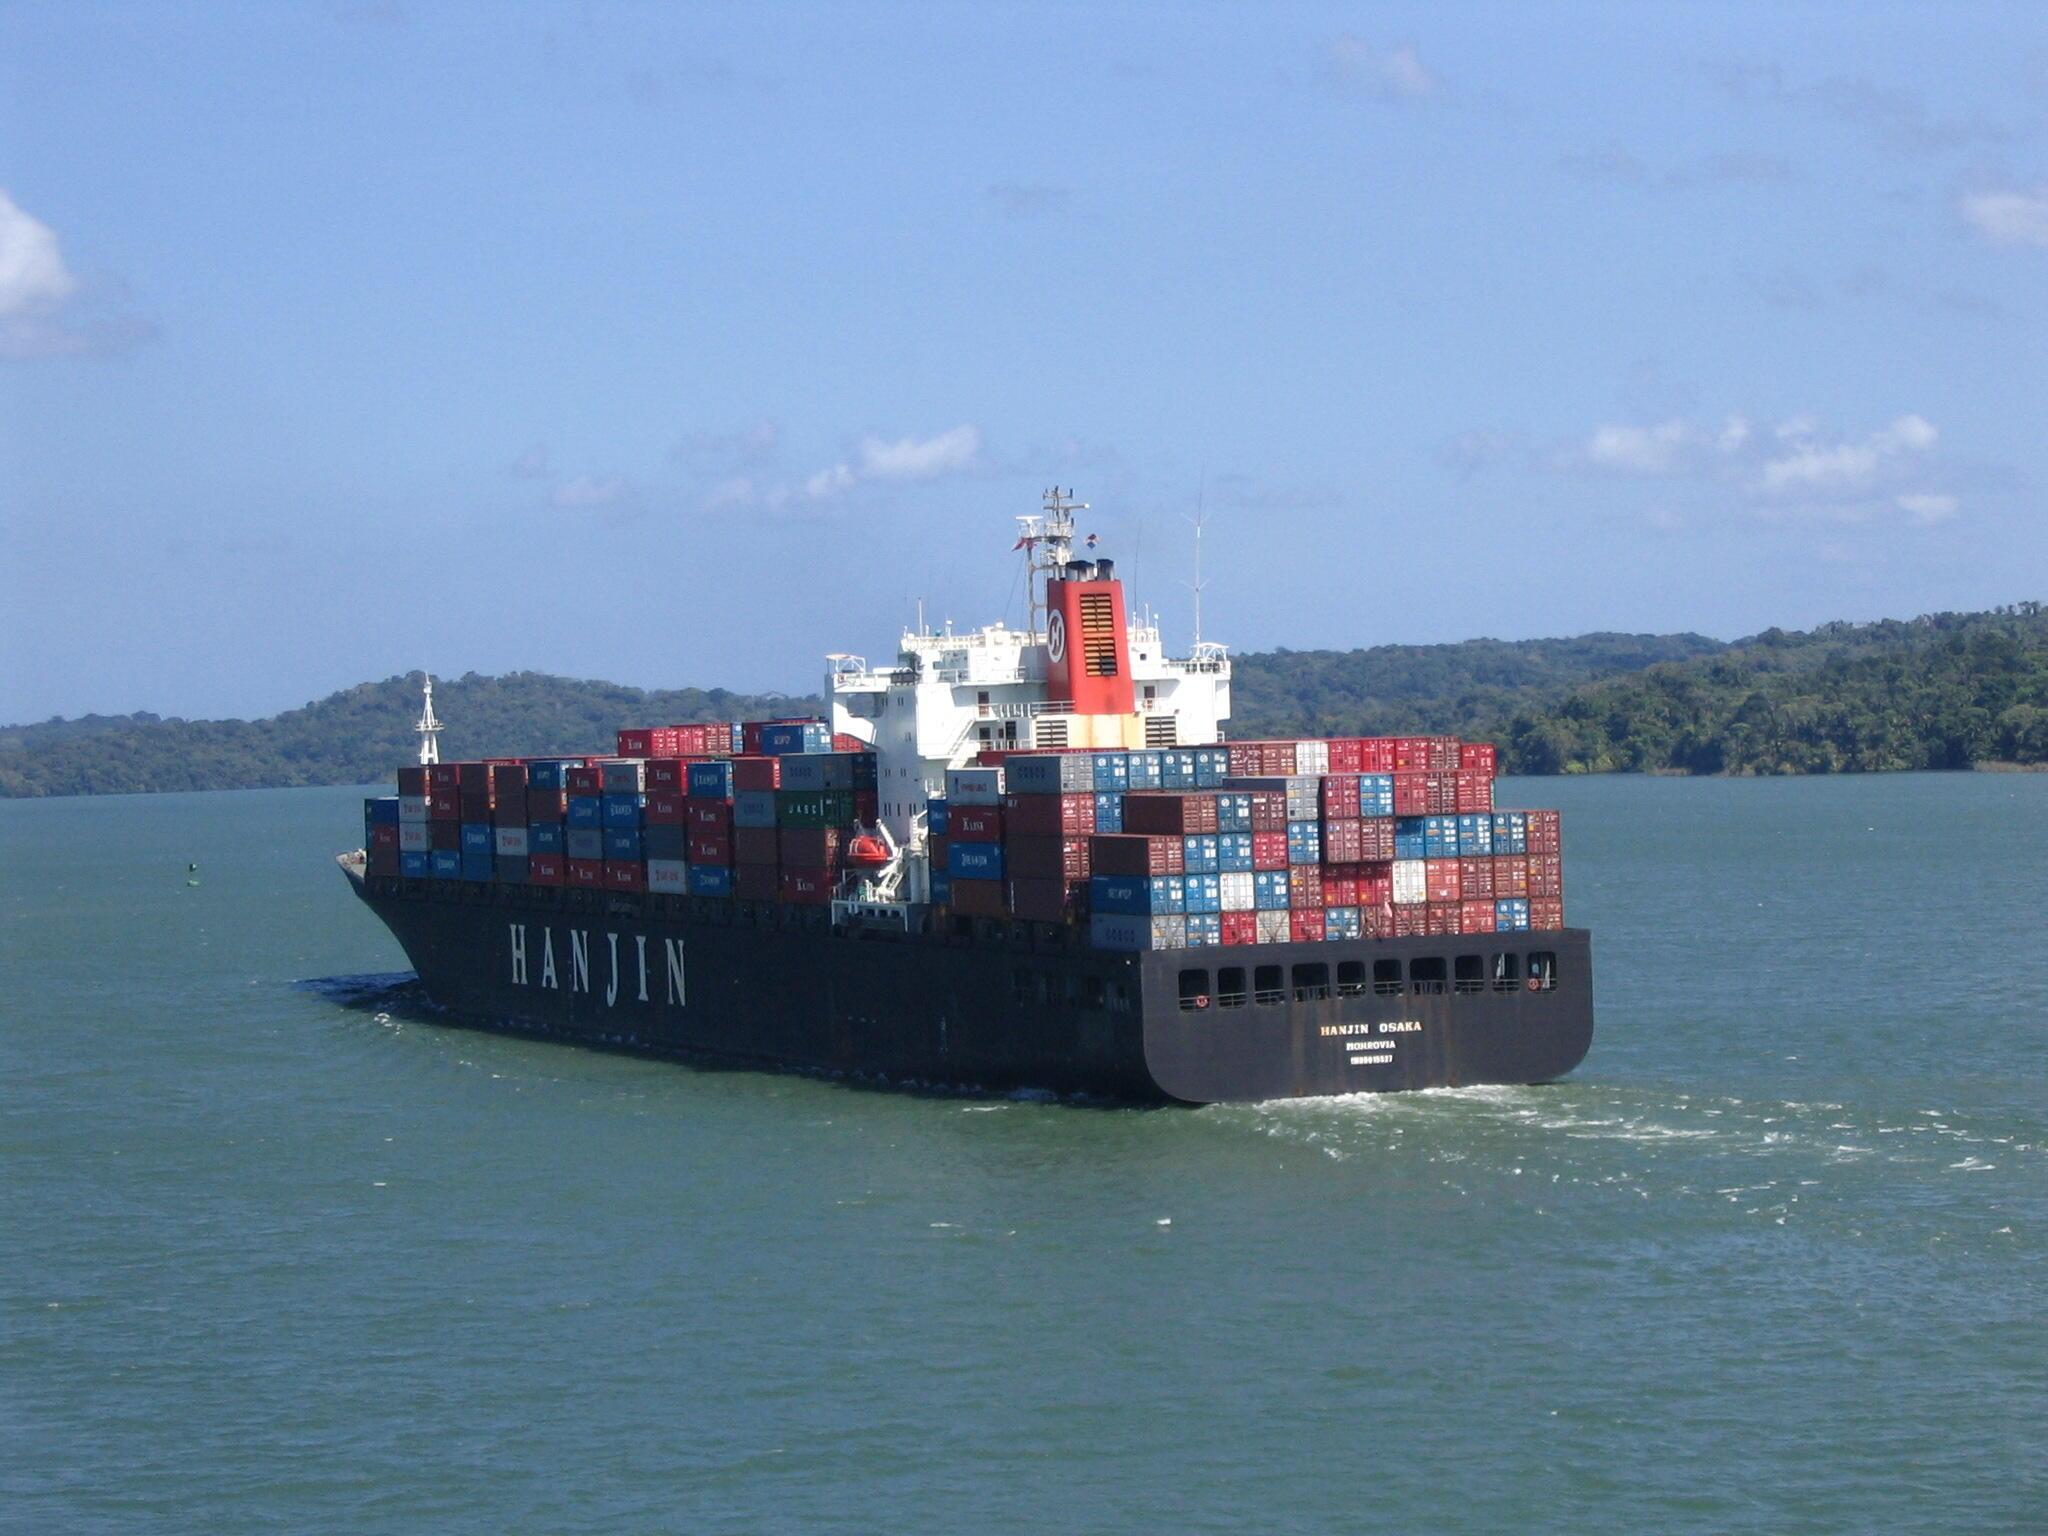 Le porte-conteneur Hanjin Osaka transitant le canal de Panama.